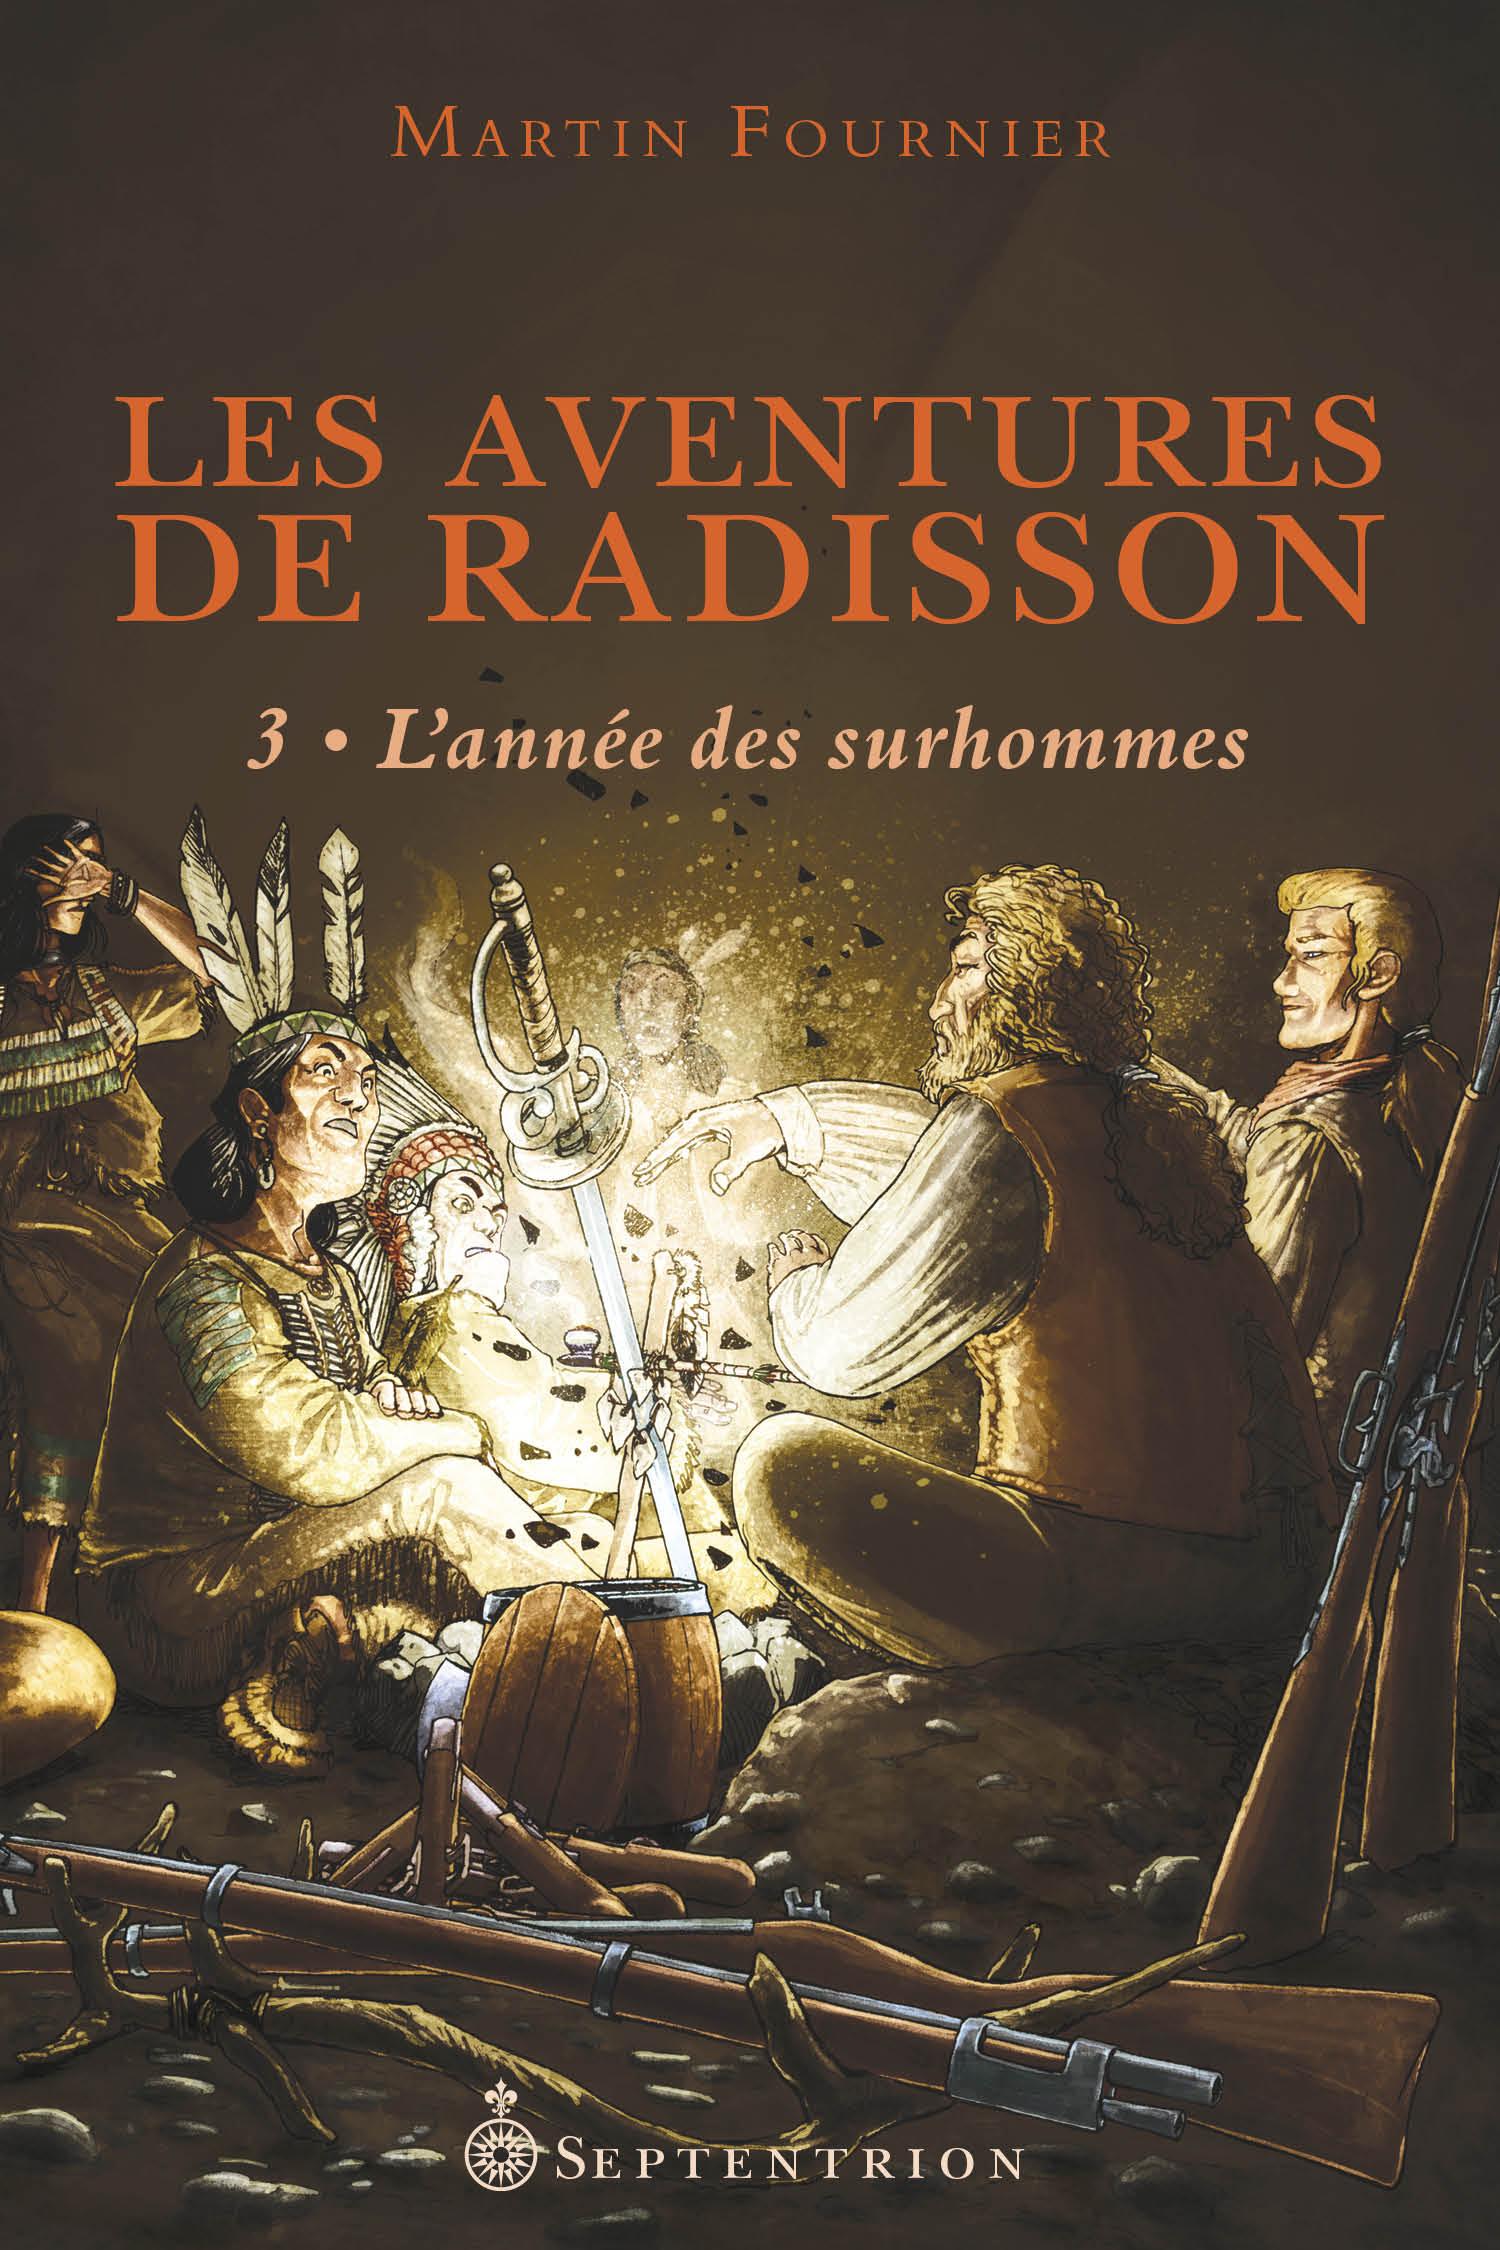 Les Aventures de Radisson, tome 3